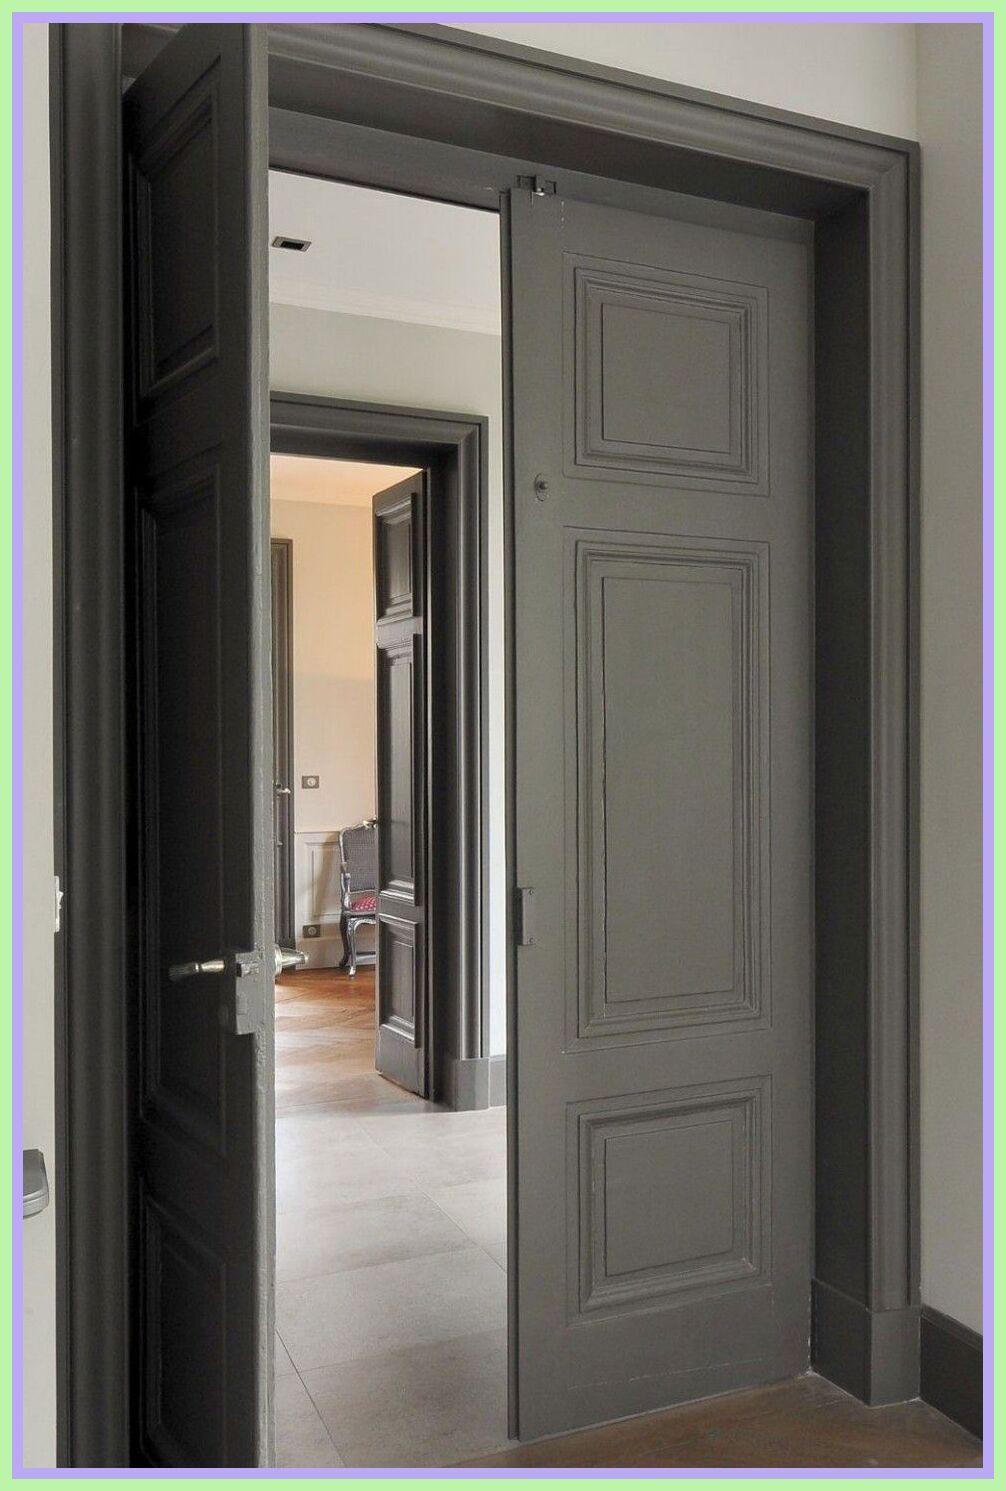 11 reference of wooden door for bedroom price【11】